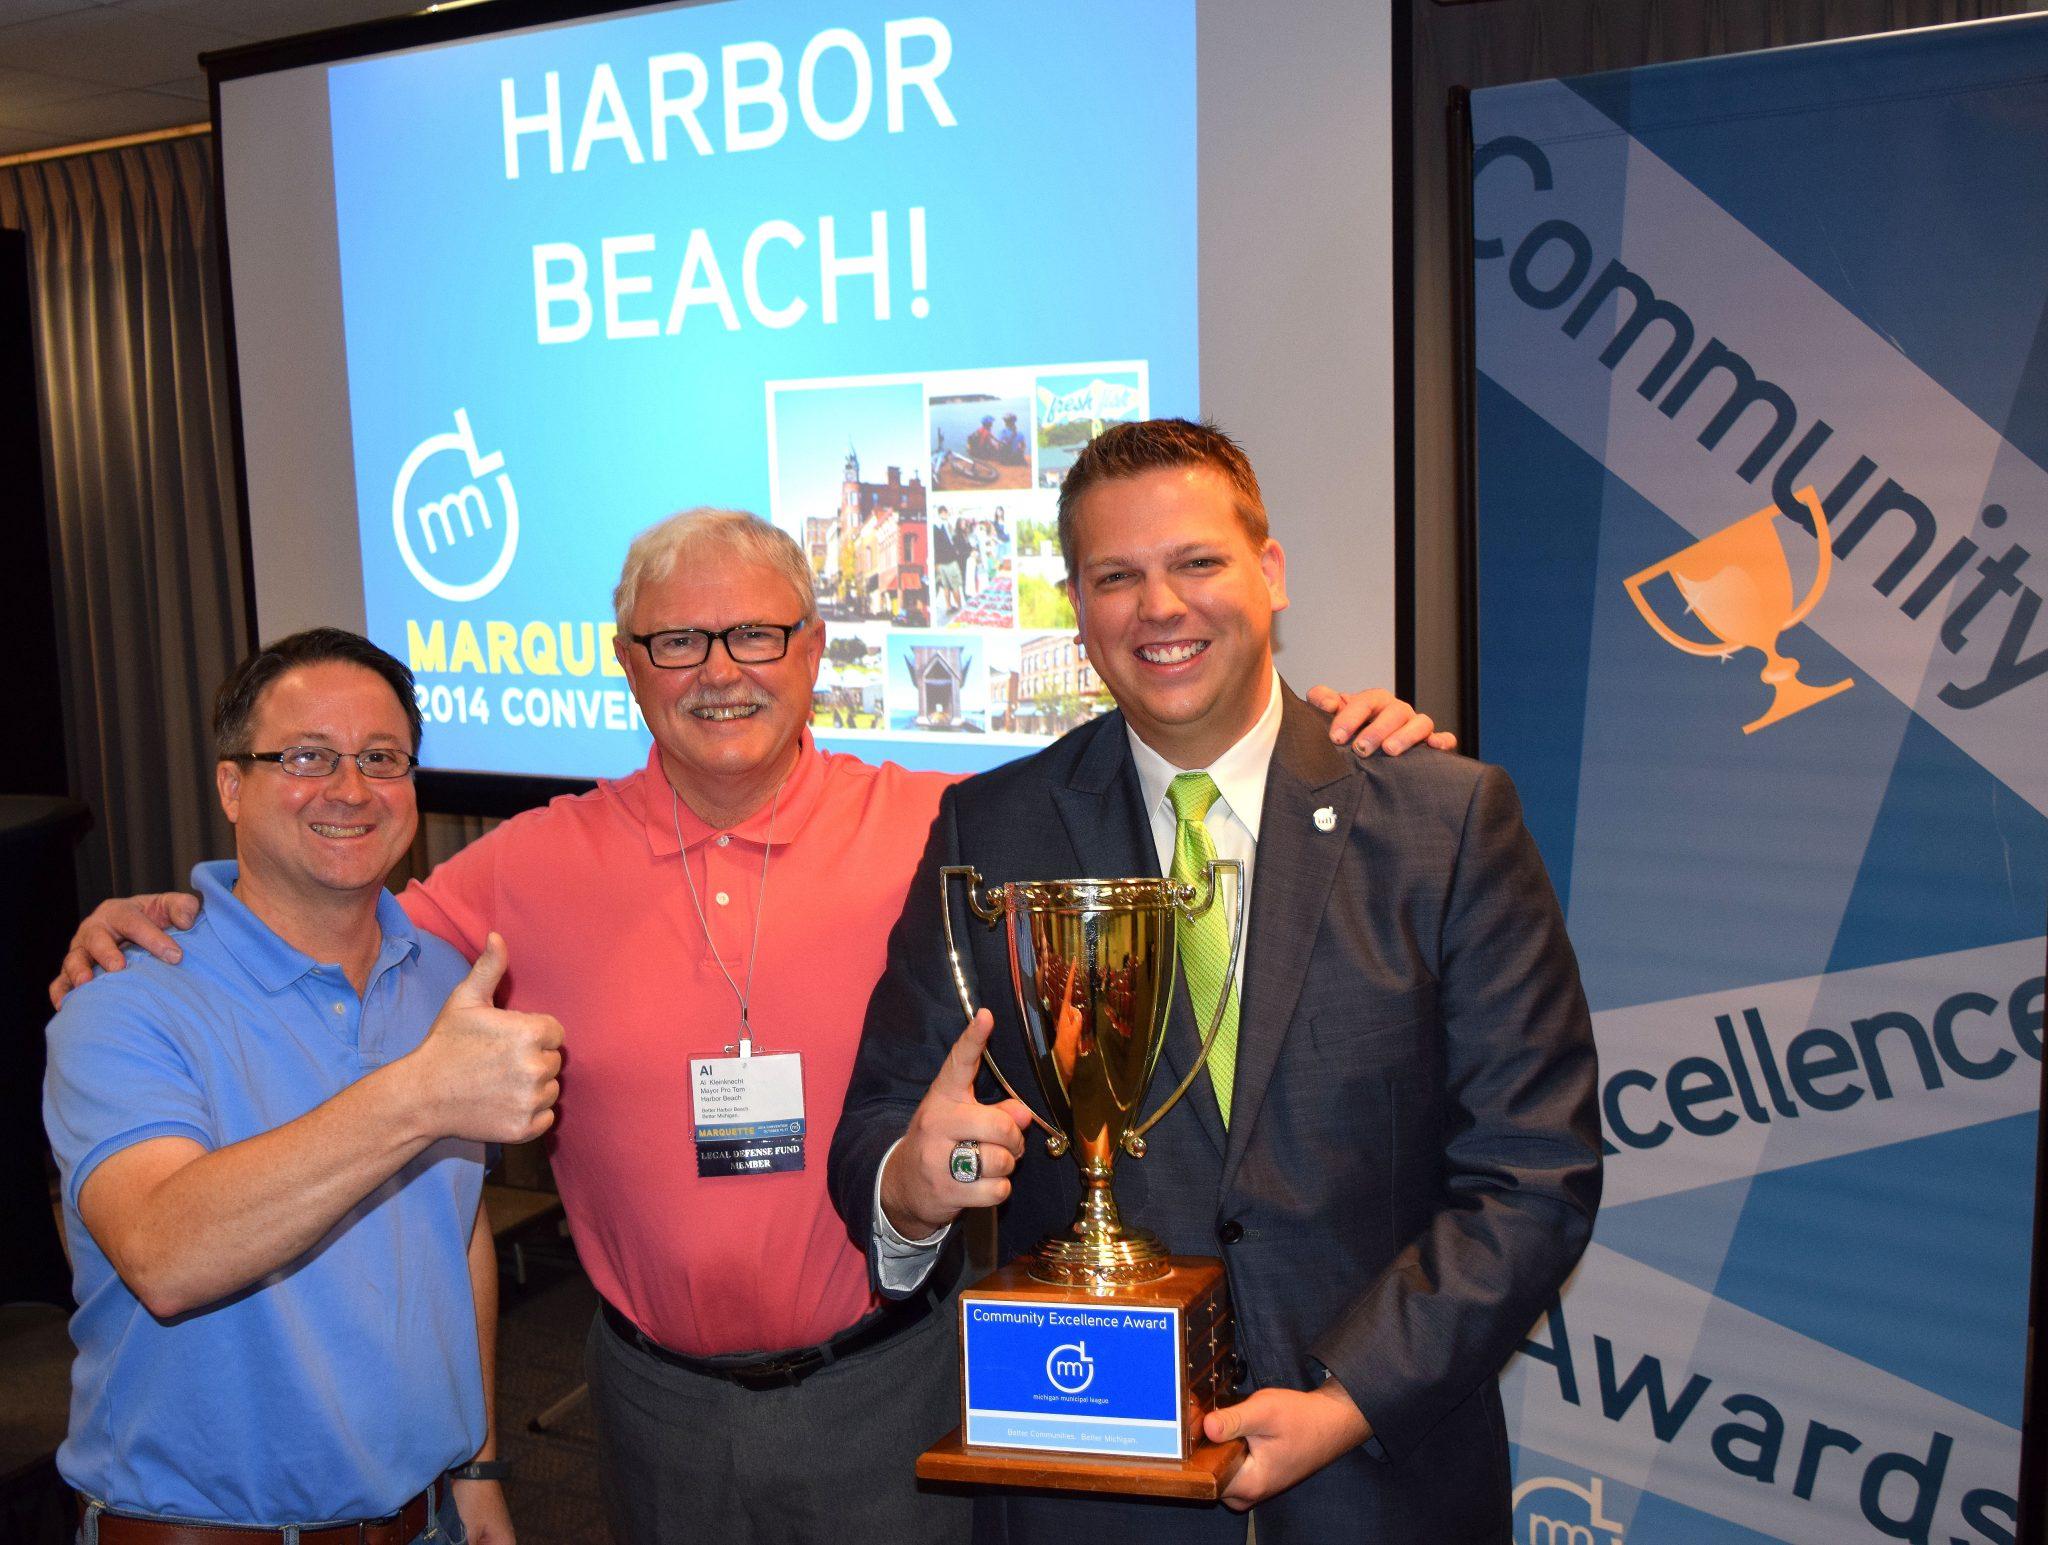 Harbor Beach Wins 2014 Michigan Municipal League Community Excellence Award